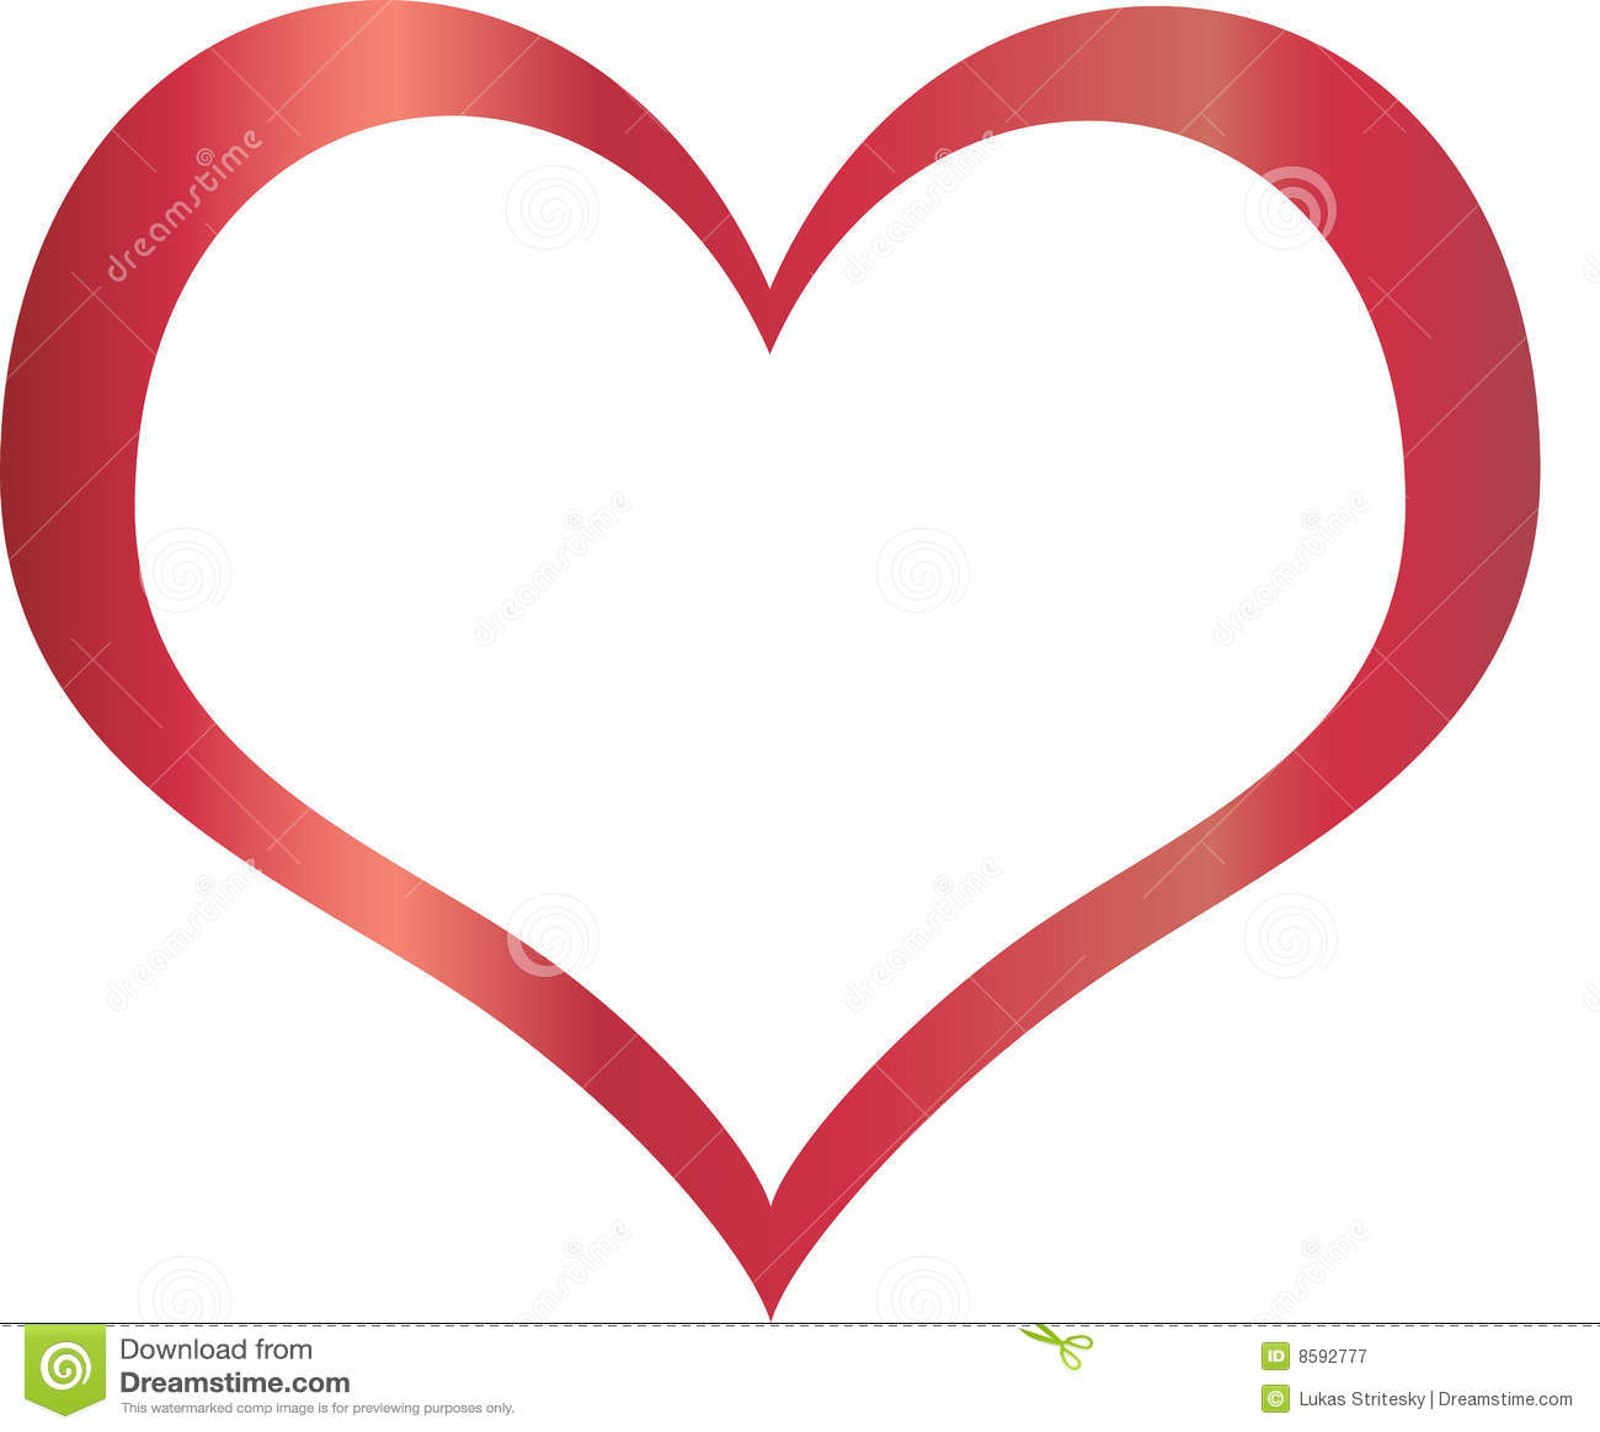 heart, heart, heart, heart, heart, heart!